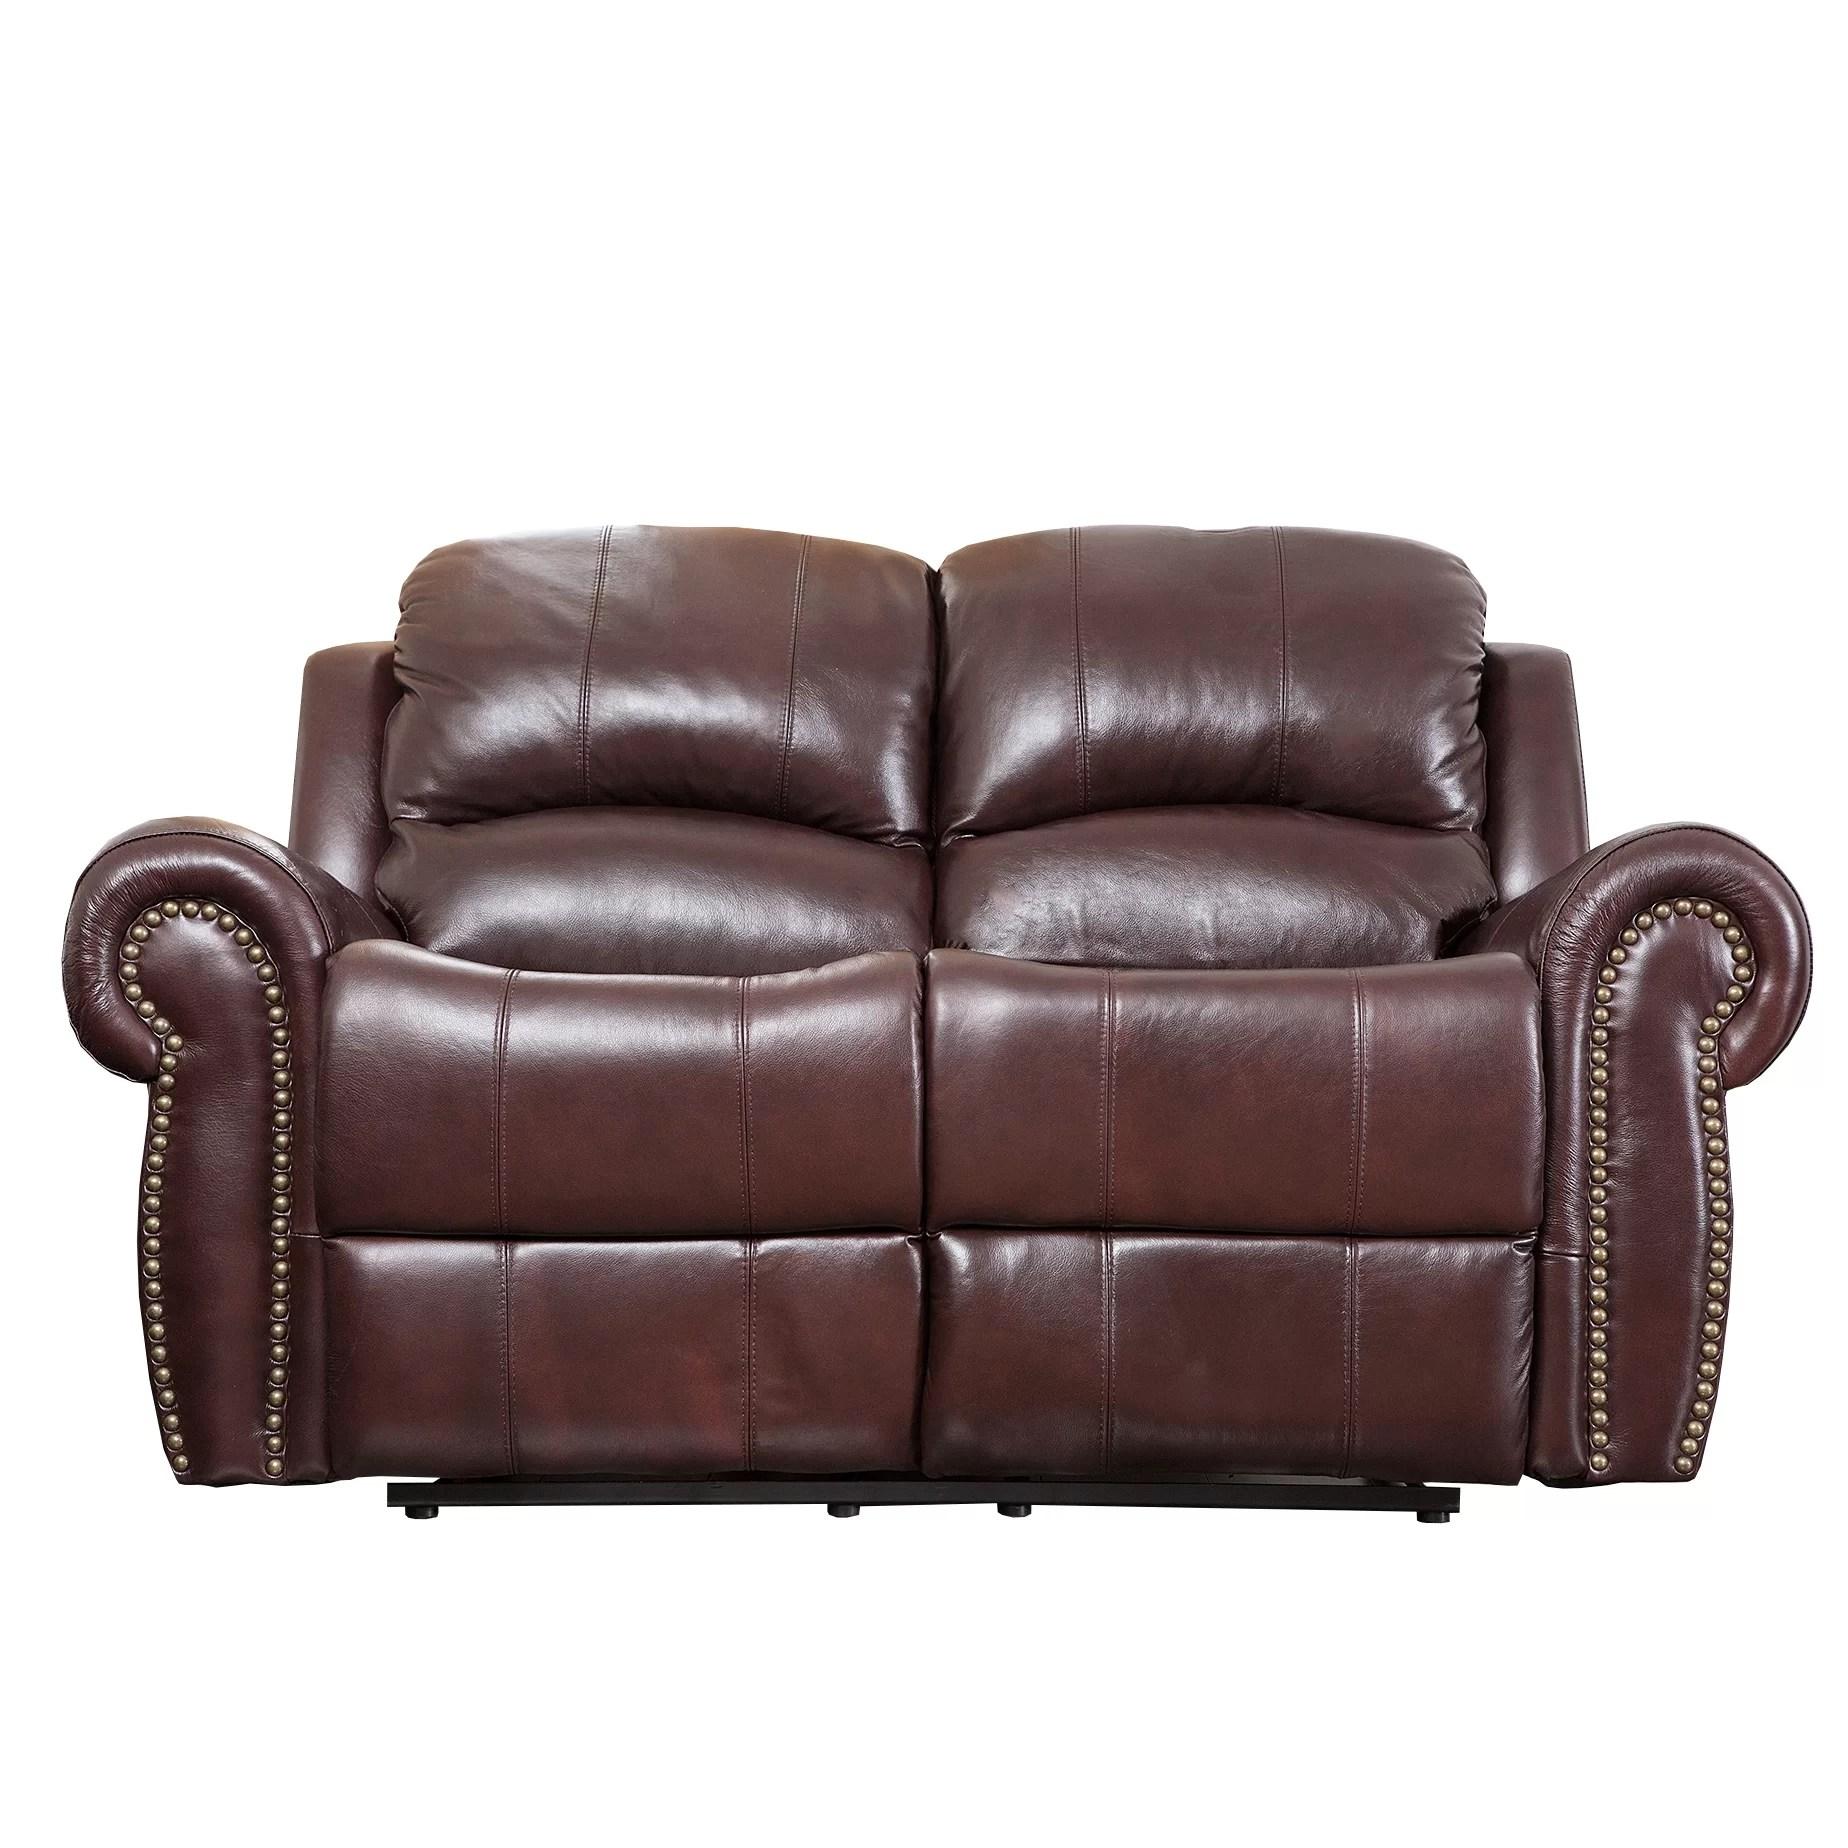 abbyson leather sofa mah jong sell living sedona reclining loveseat and reviews